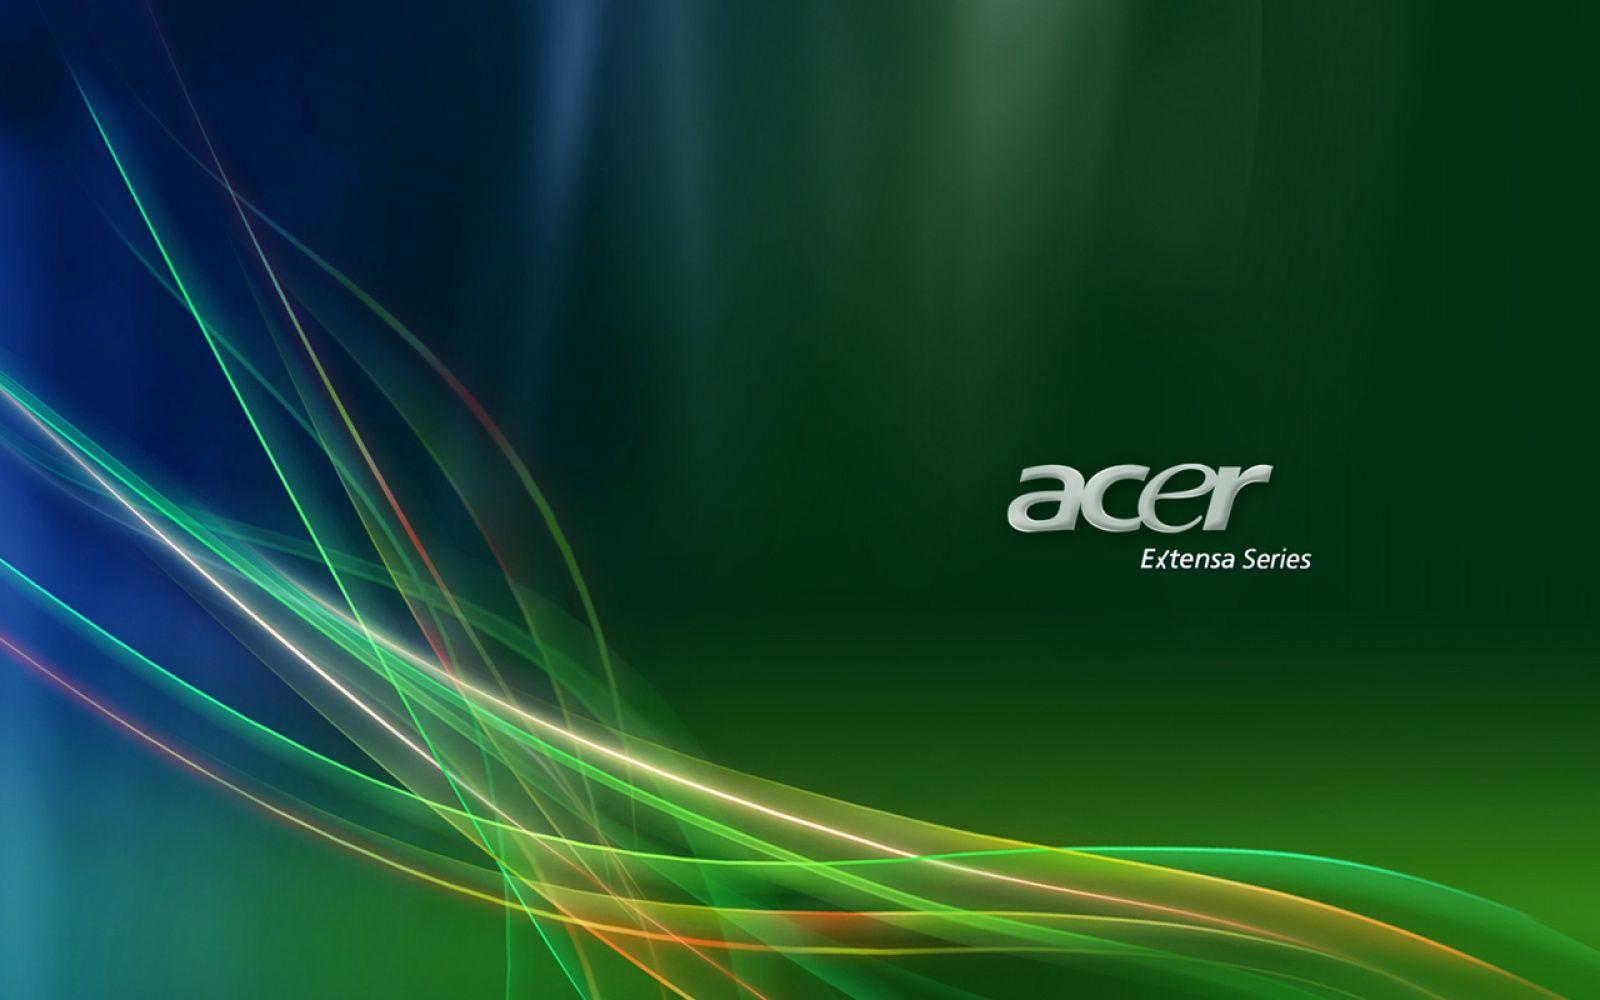 3d Acer Wallpaper For Pc Wallpapersafari Acer Desktop Acer Desktop Wallpaper